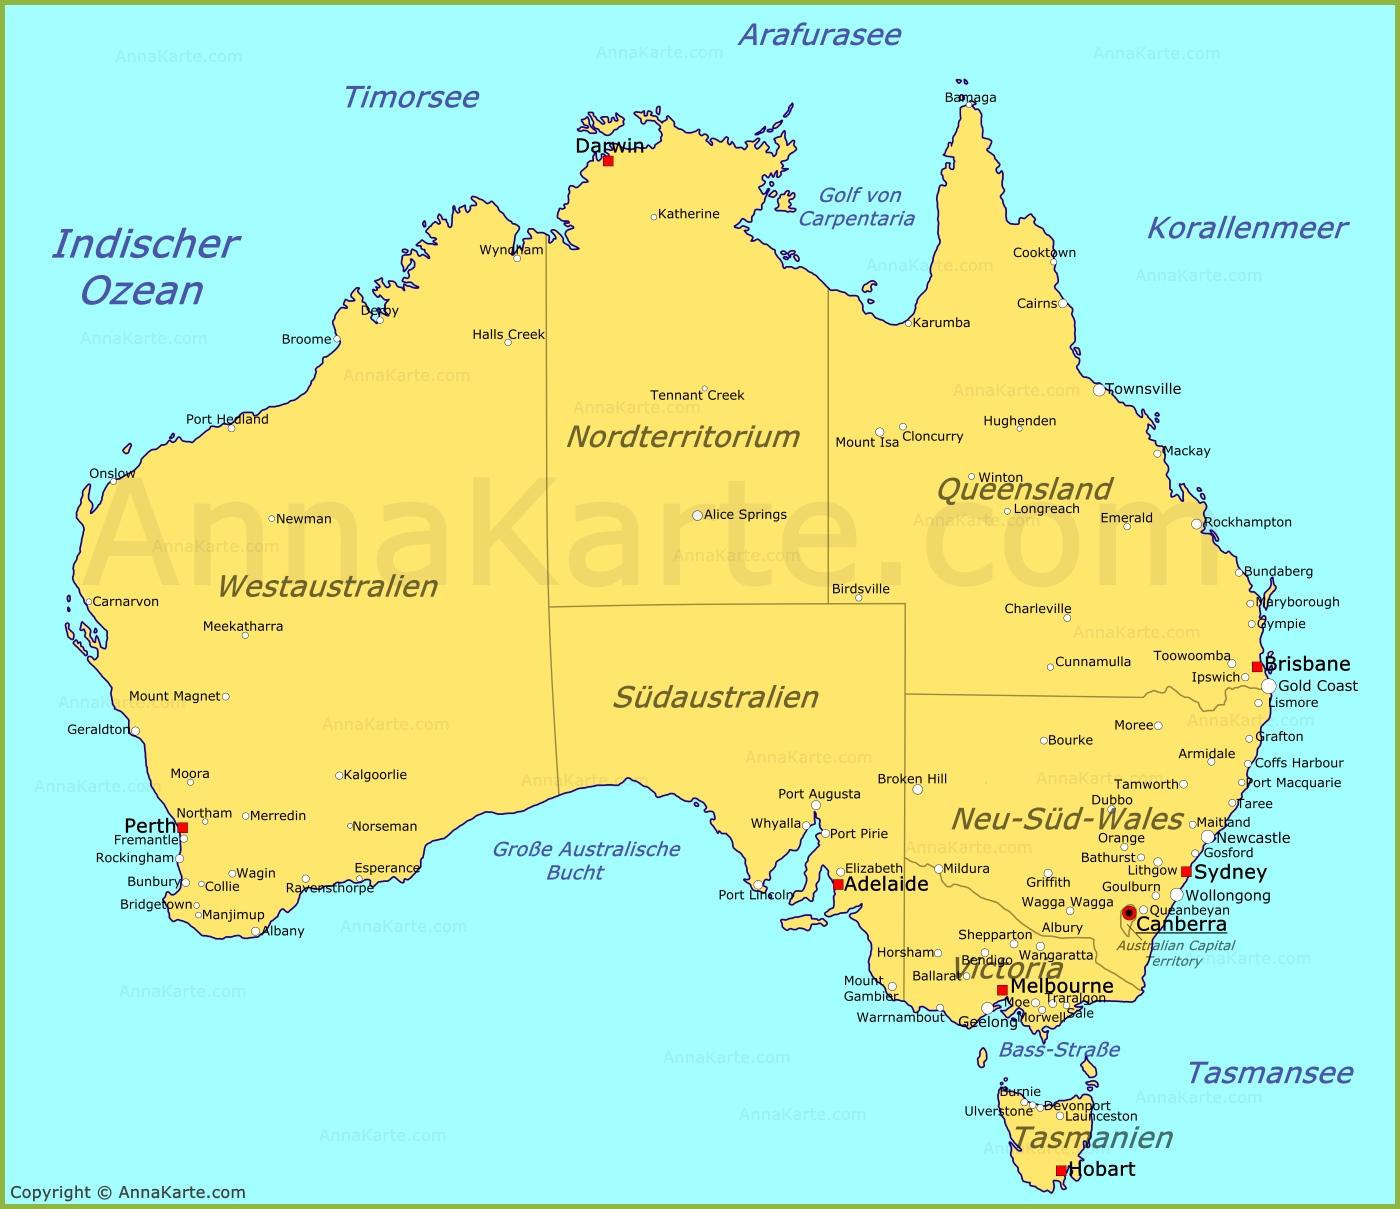 Karte Australien Englisch.Australien Karte Annakarte Com